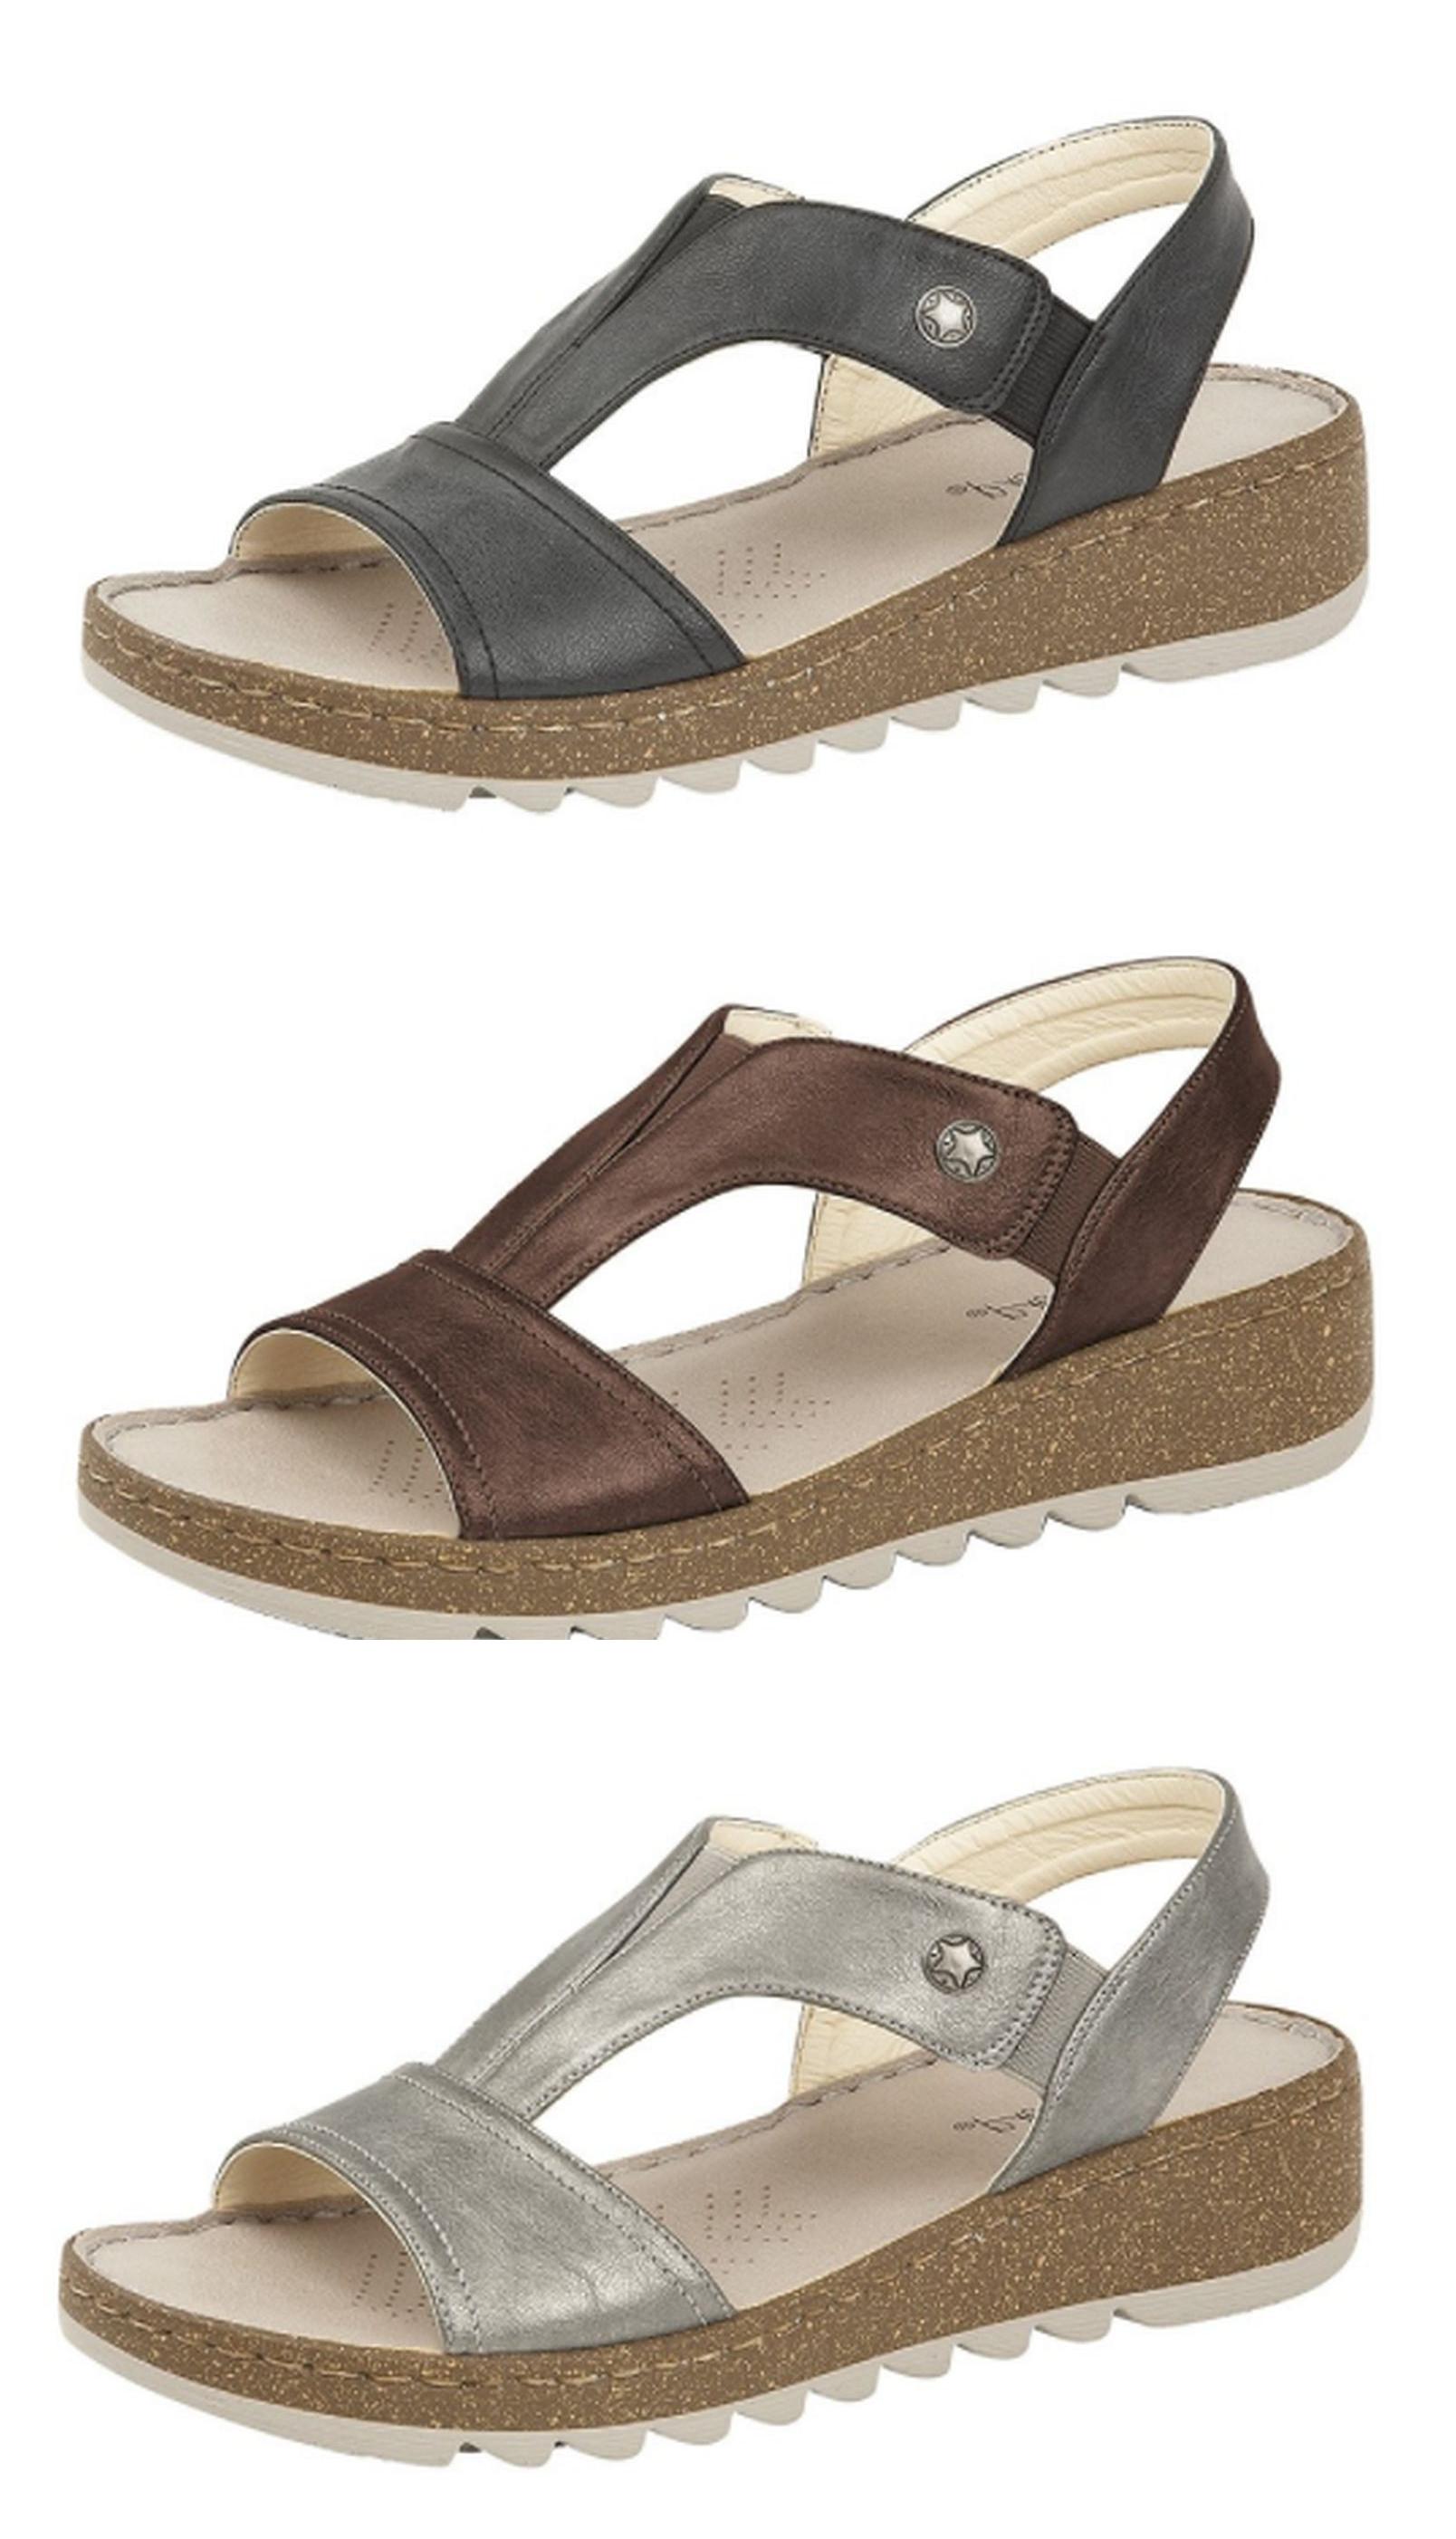 sandals gh lyst metallic comforter louisa view h co fullscreen shoes in sandal comfort bass g wedge